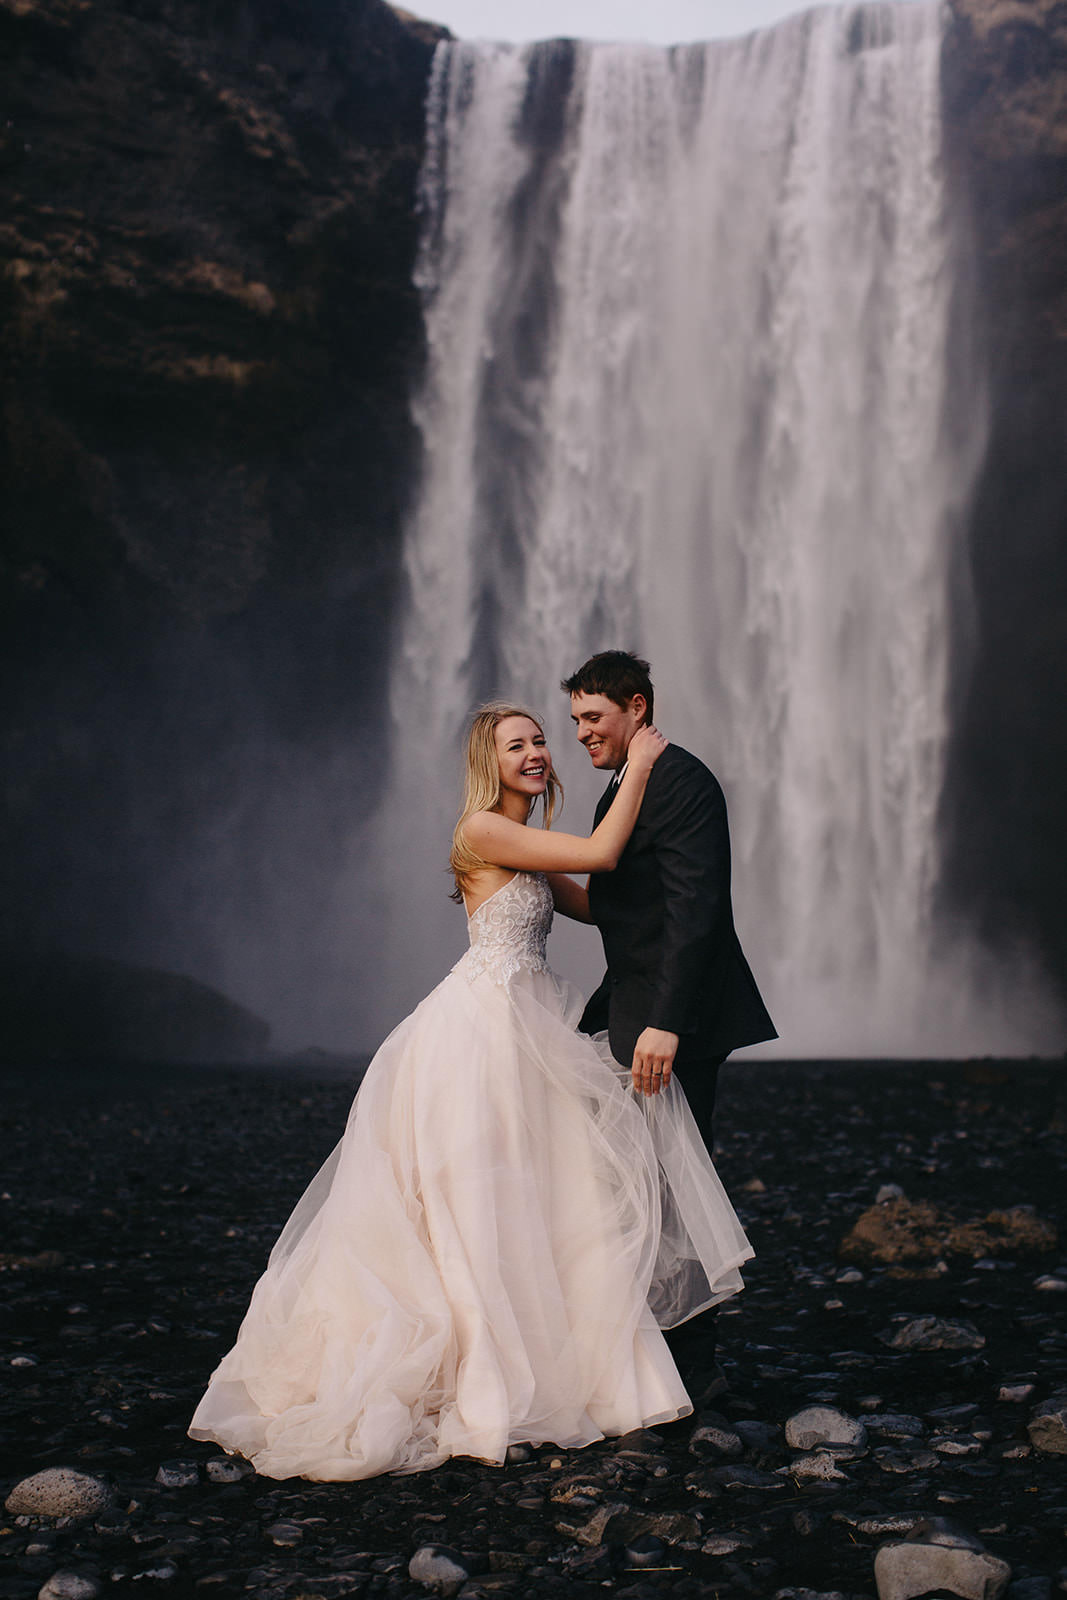 Icelandic Iceland Elopement Wedding Elope Photographer Eloping Reykjavík Vik Black Sand Beach Jökulsárlón Skogafoss Waterfall Vestrahorn Mountain Liz Osban Photography Destination 103.jpg